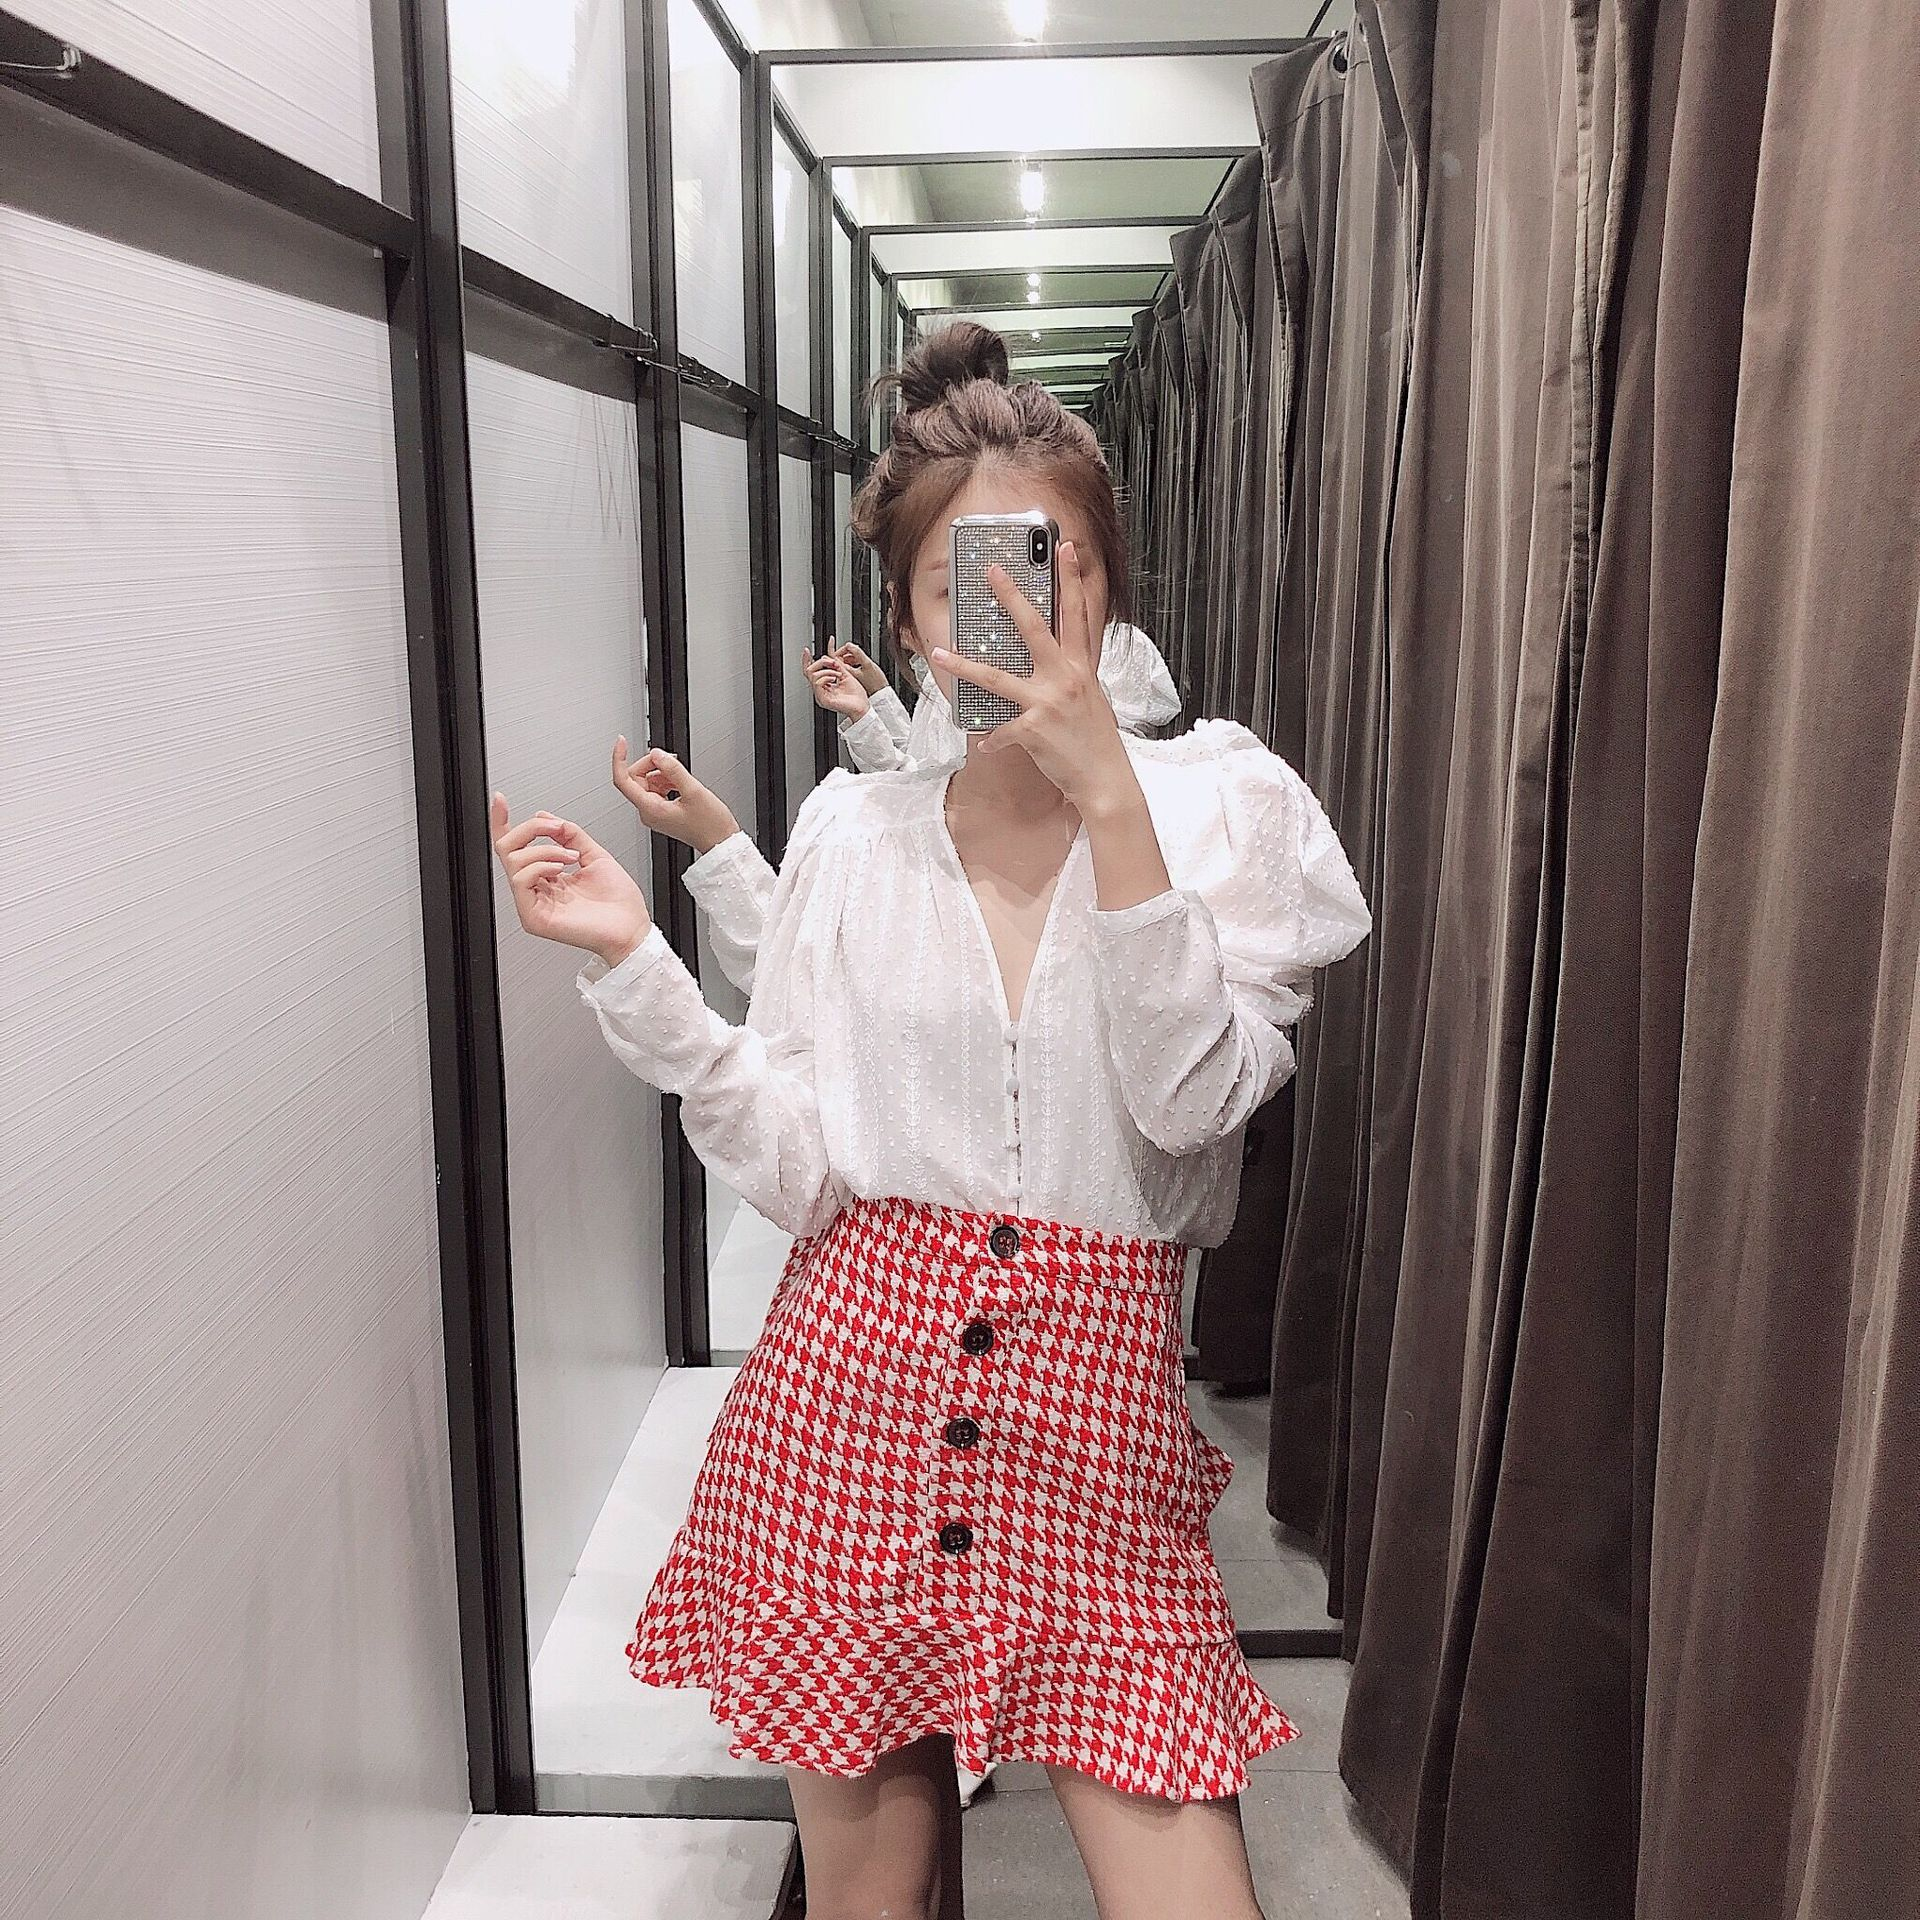 Hg46 Pattern High-waisted Slimming Plaid Mini Skirt Red